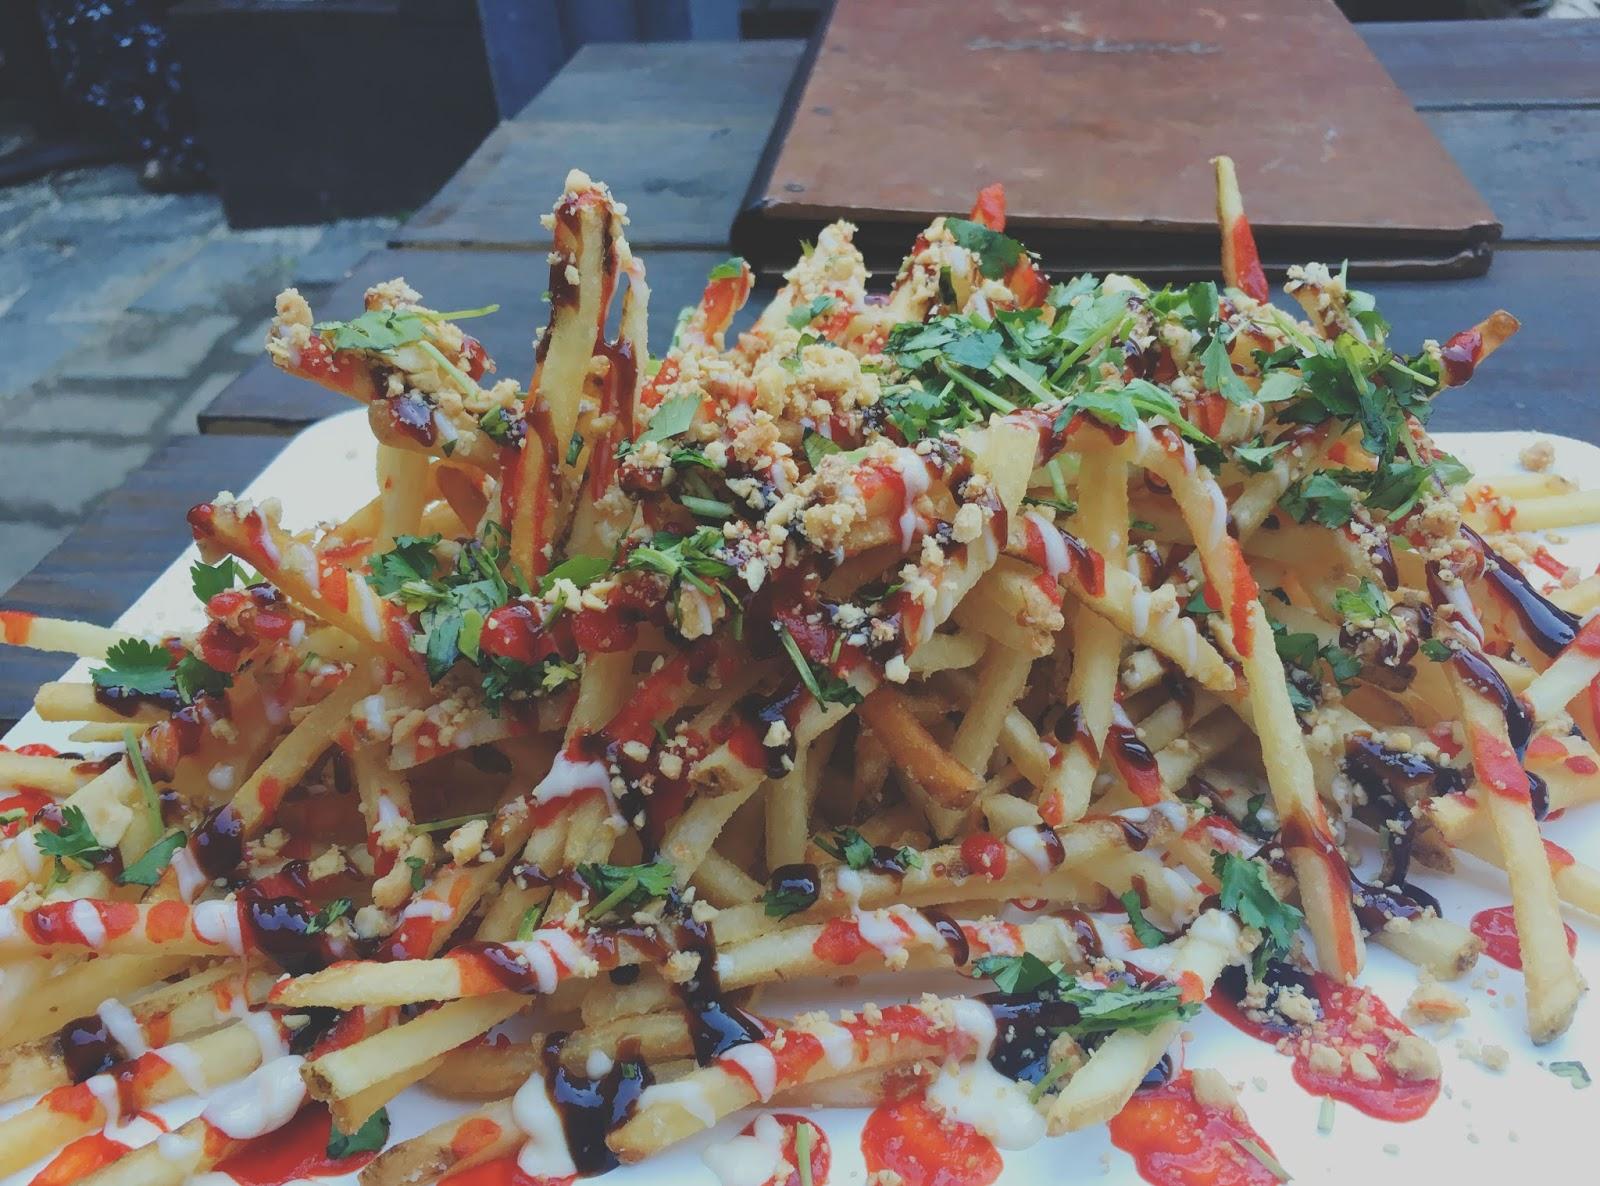 Vietnamese fries at Boheme - a restaurant in Houston, Texas